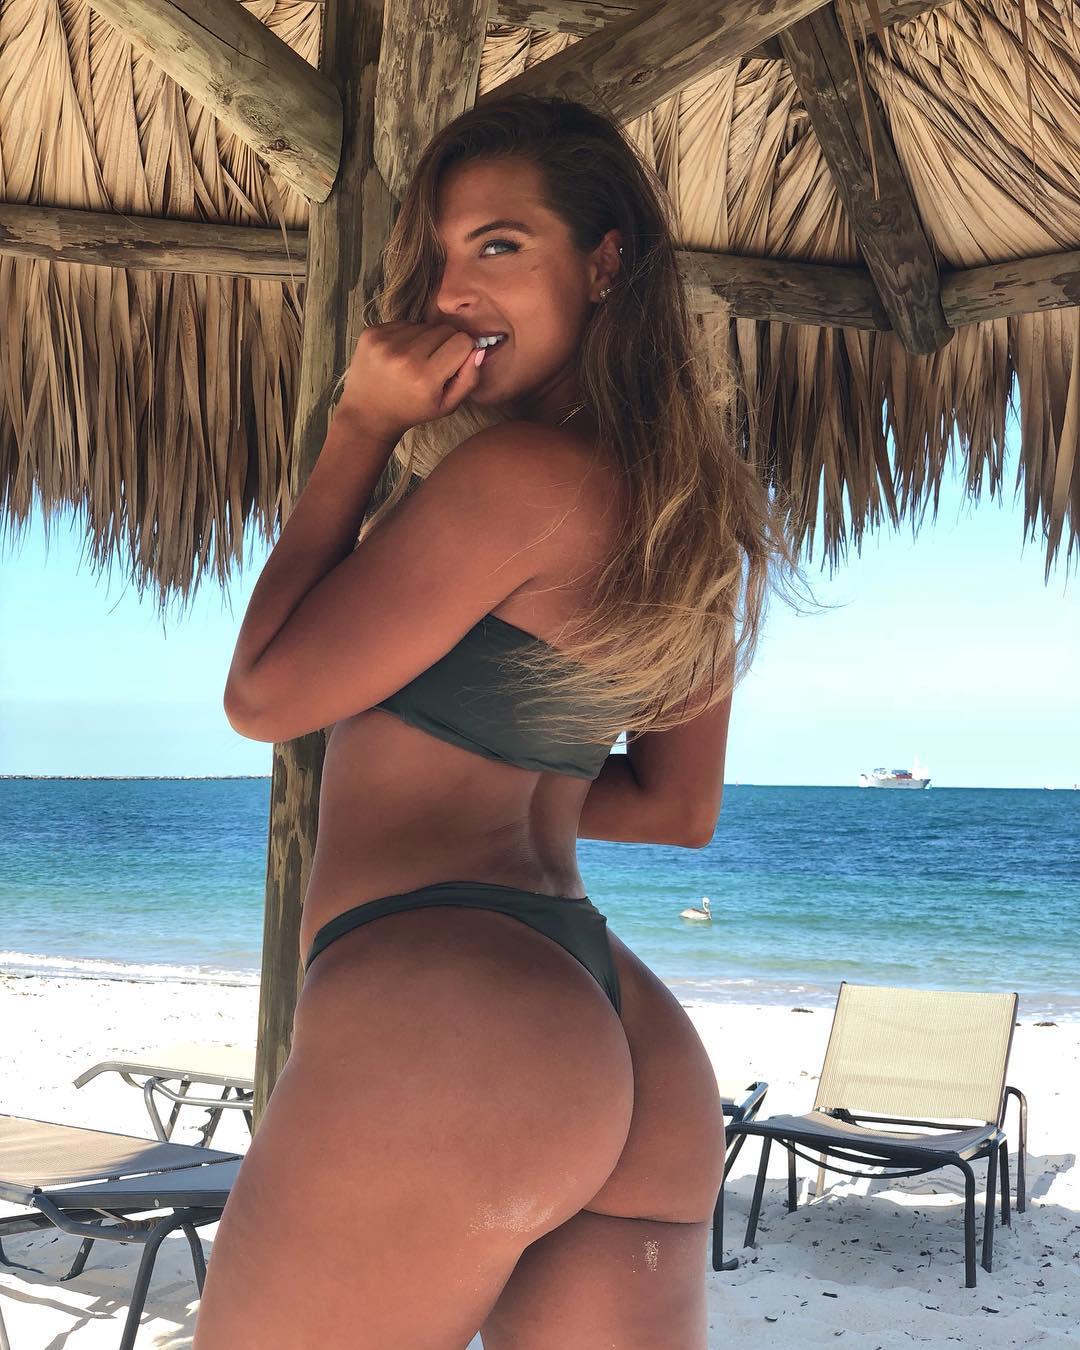 Natalia Garibotto Nude Onlyfans Leaked 0026